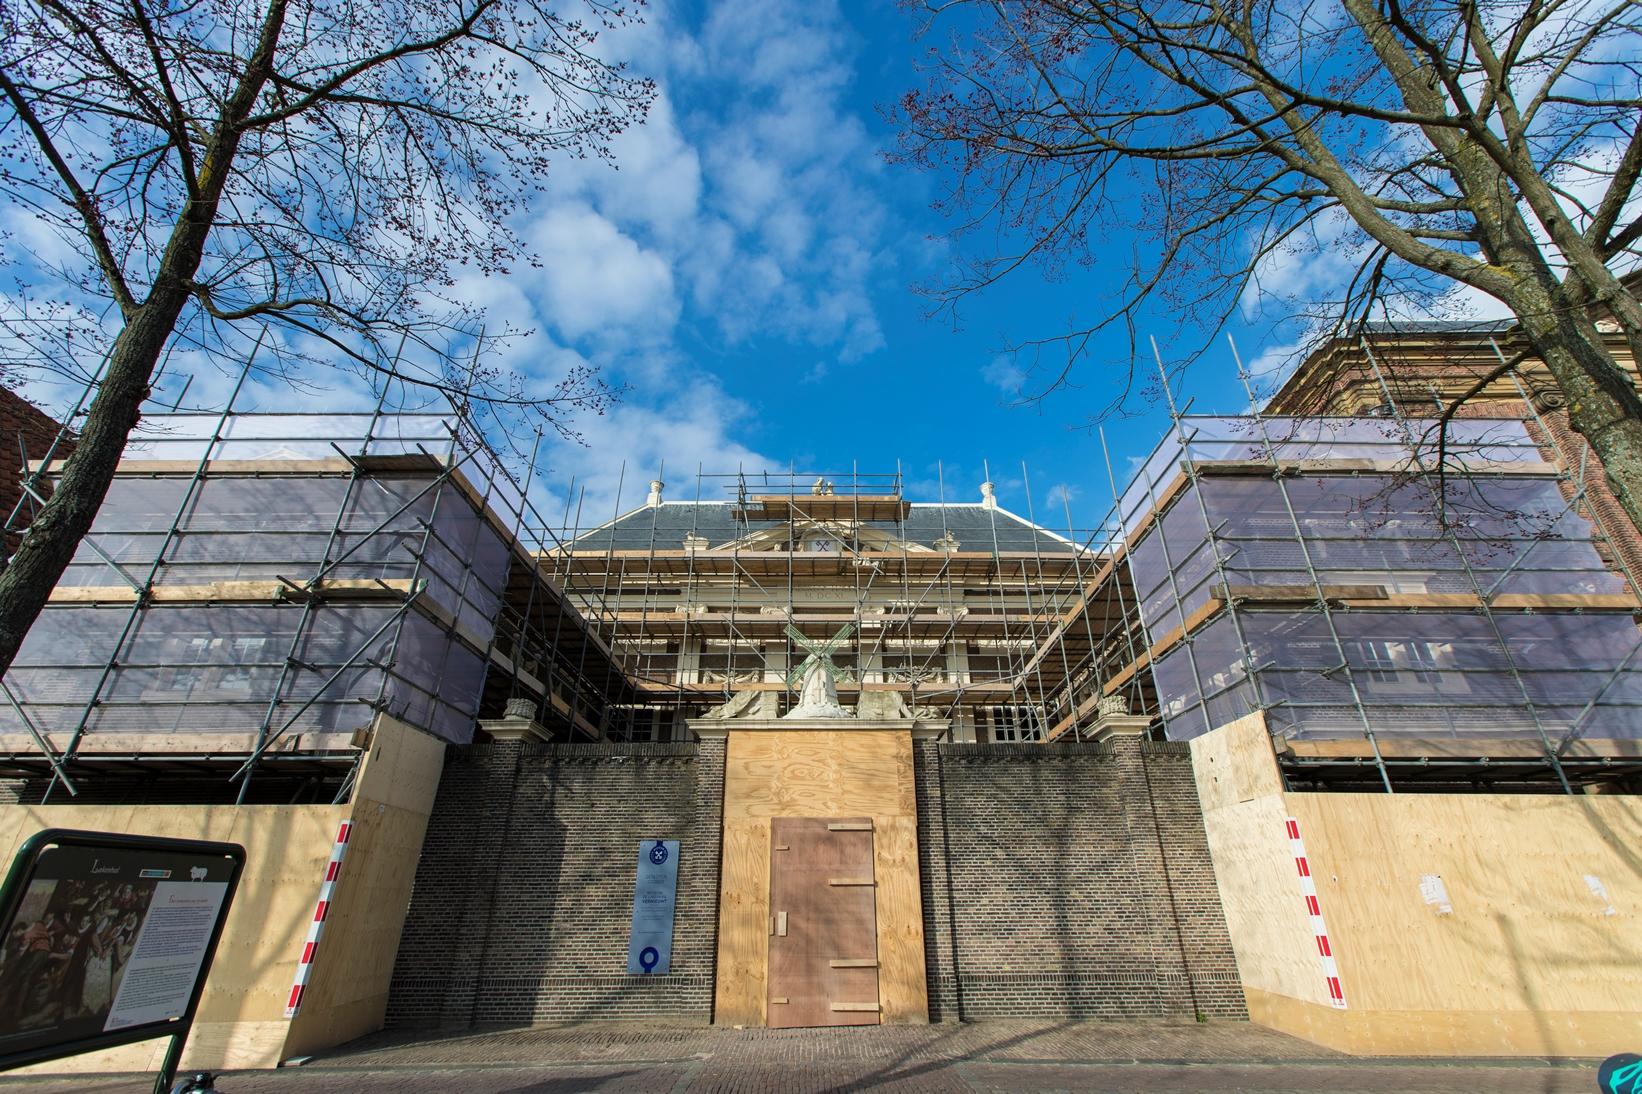 Museum De Lakenhal in de steigers